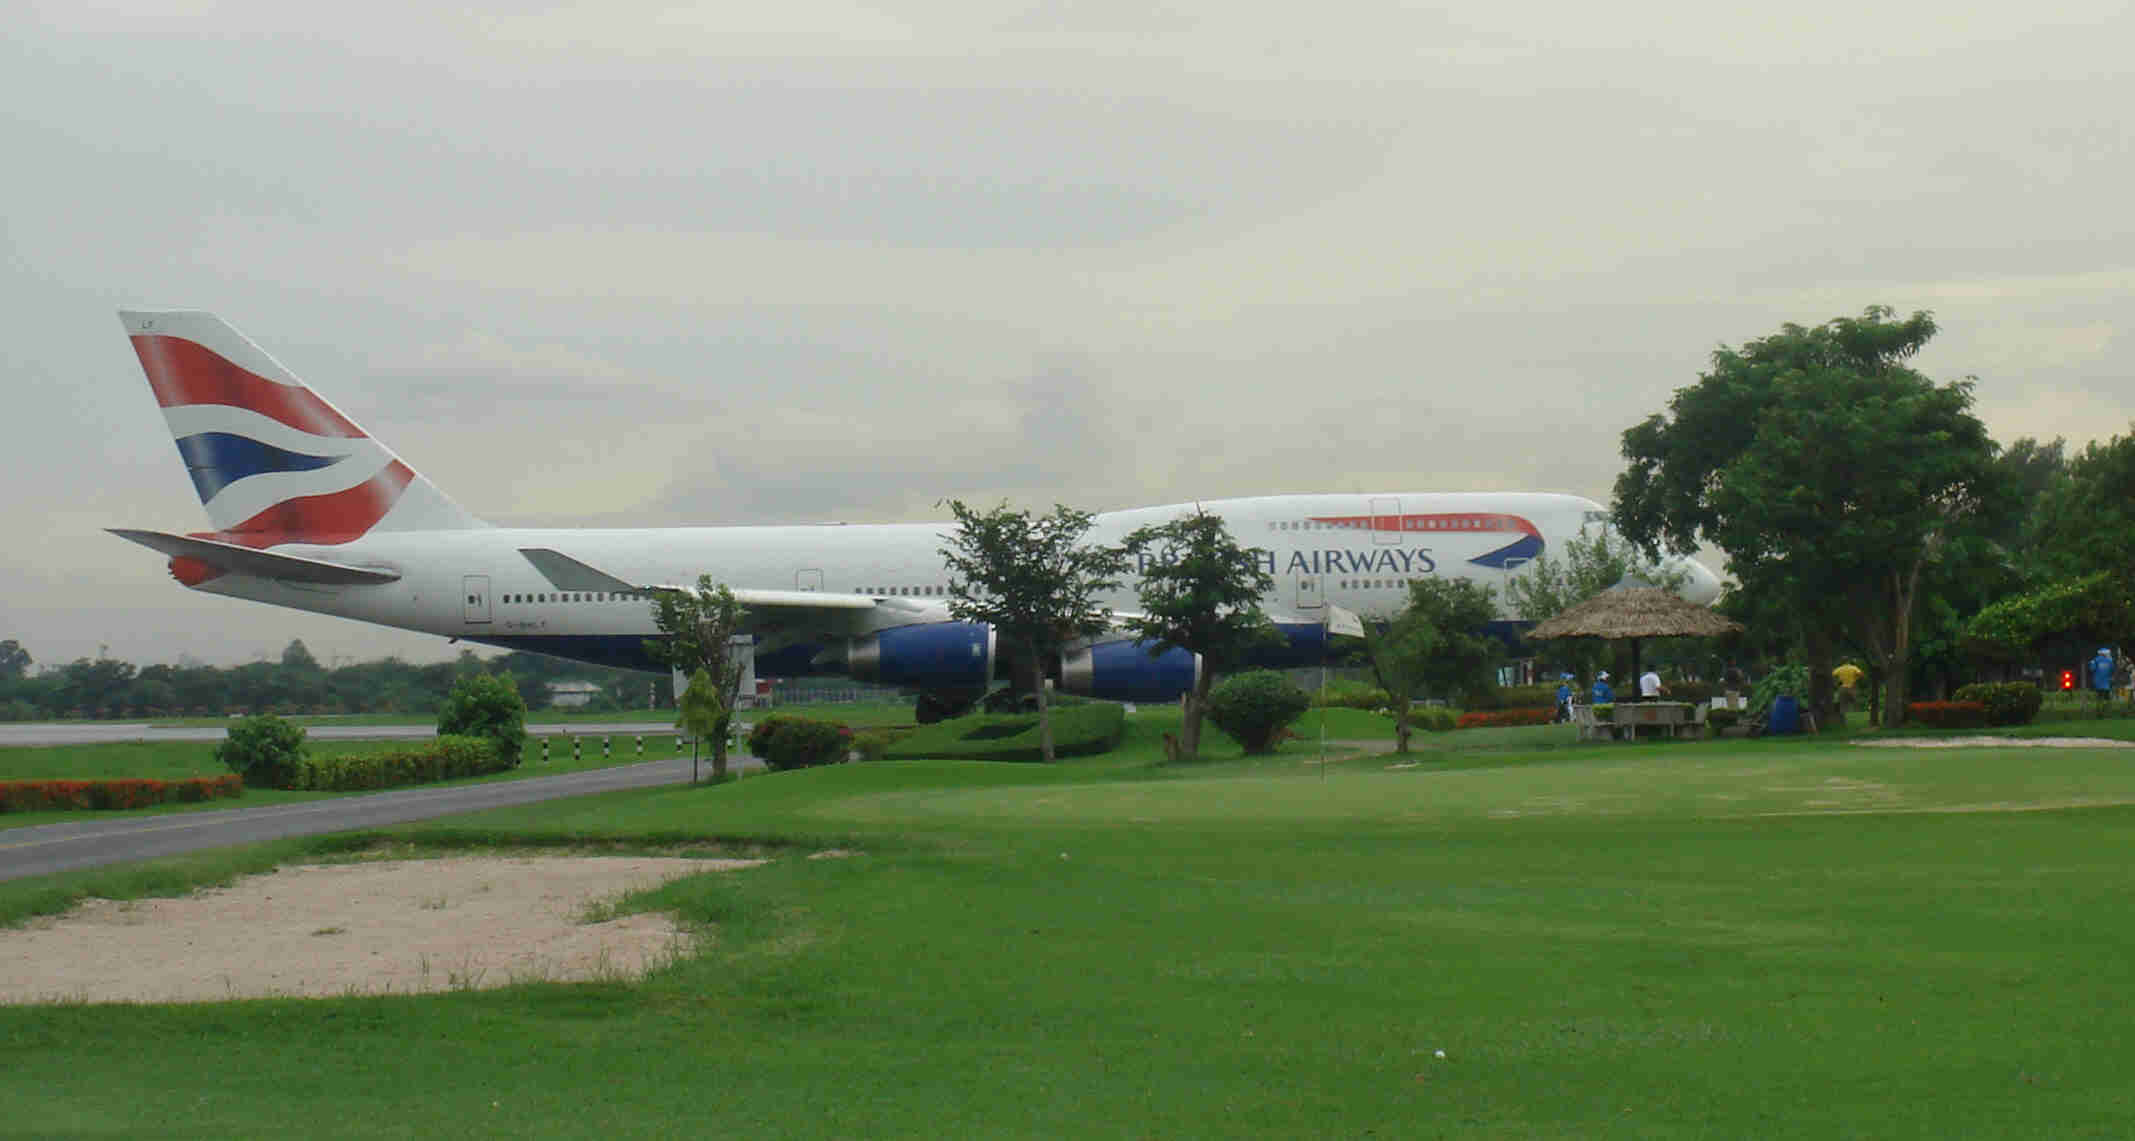 kantaratba Top 10 Weirdest Airport in The World